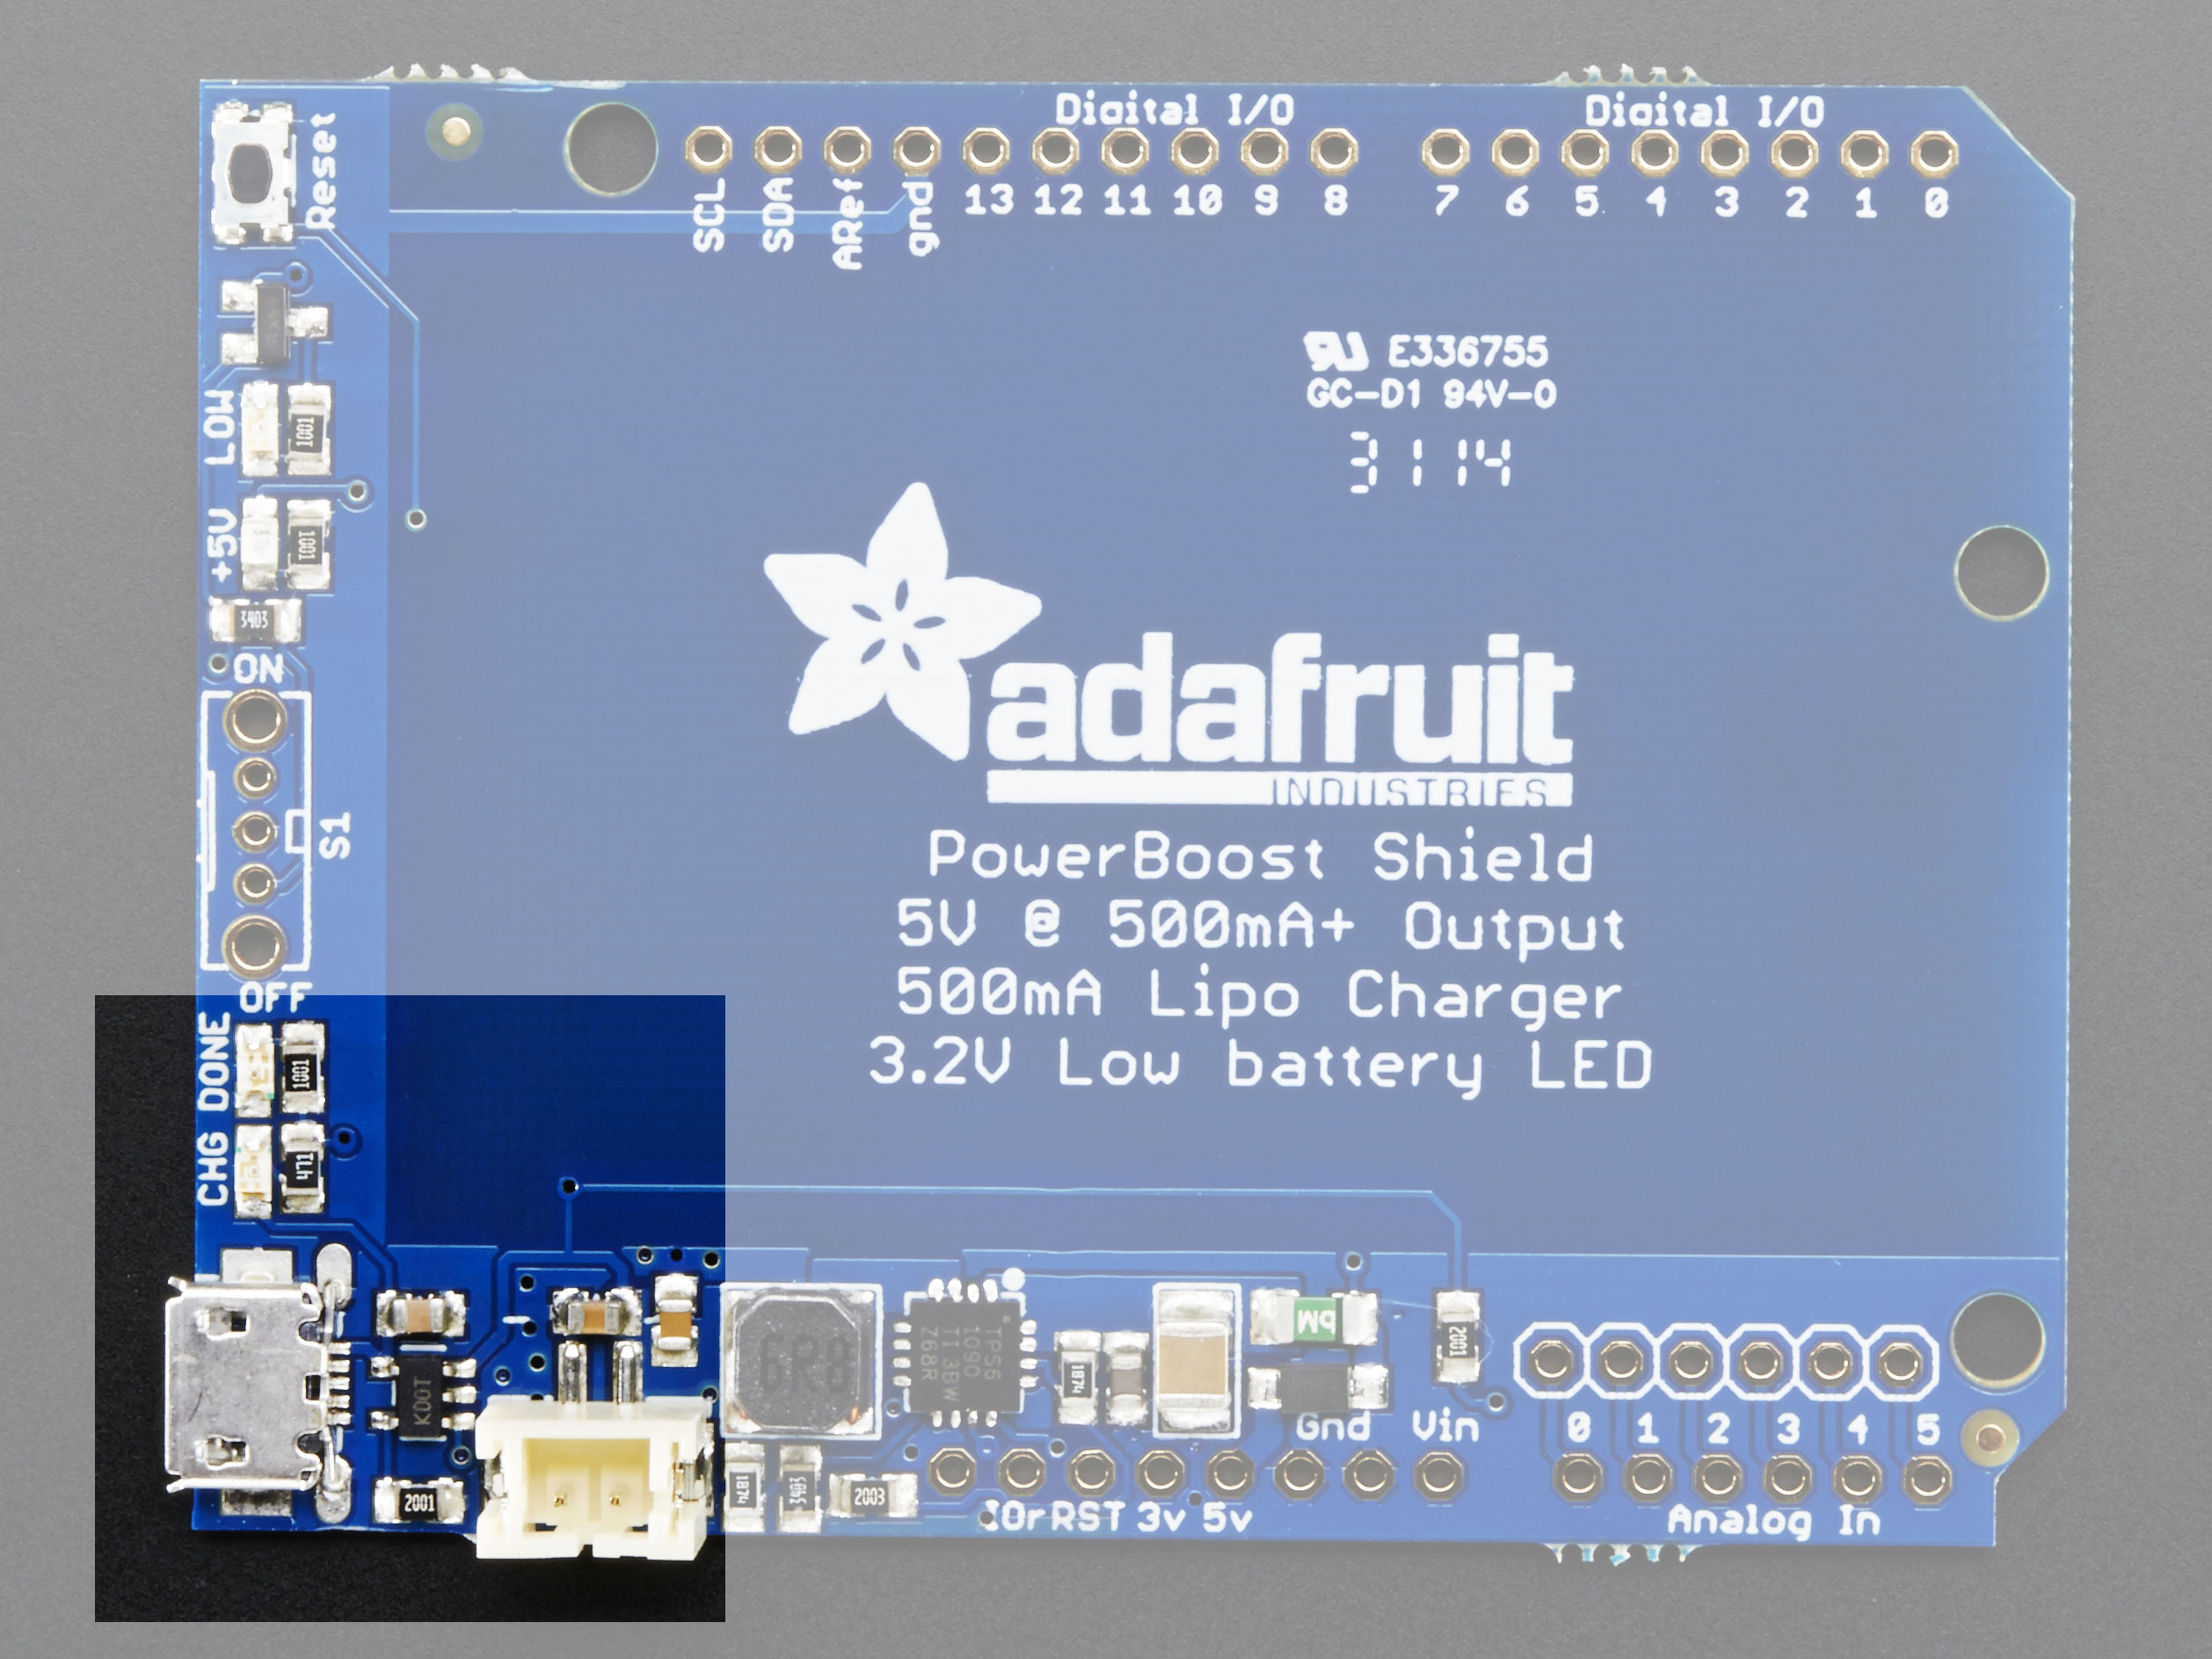 adafruit_products_chargingsection.jpg